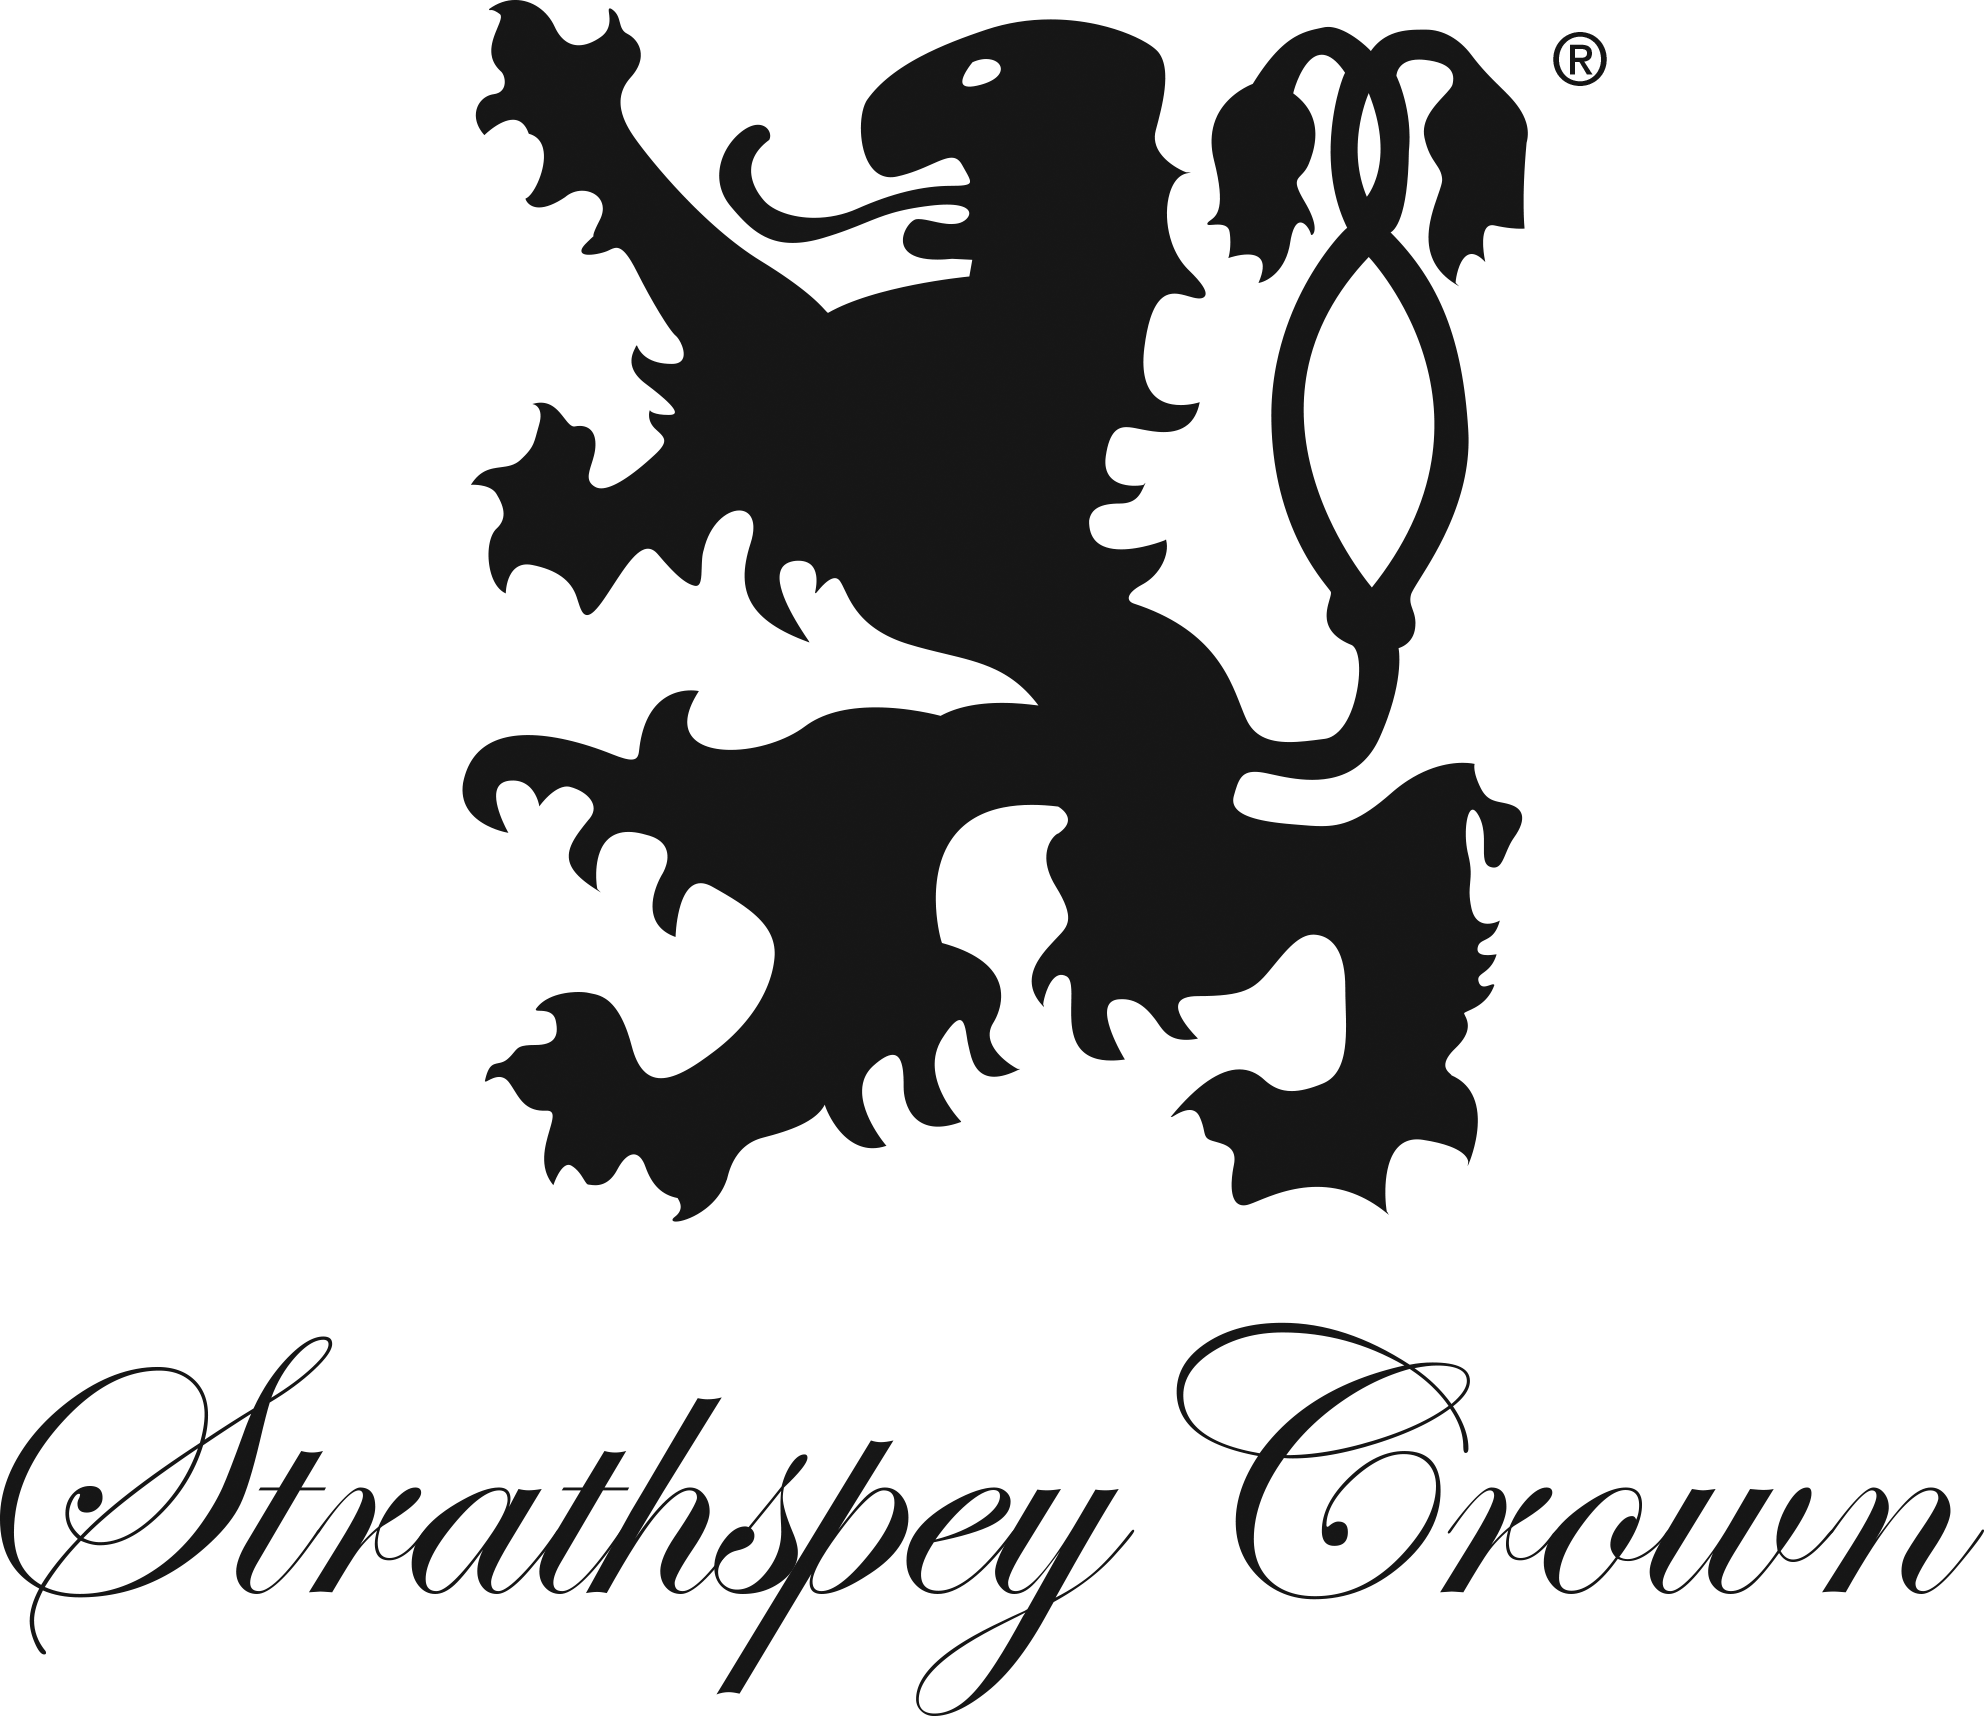 Strathspey Crown